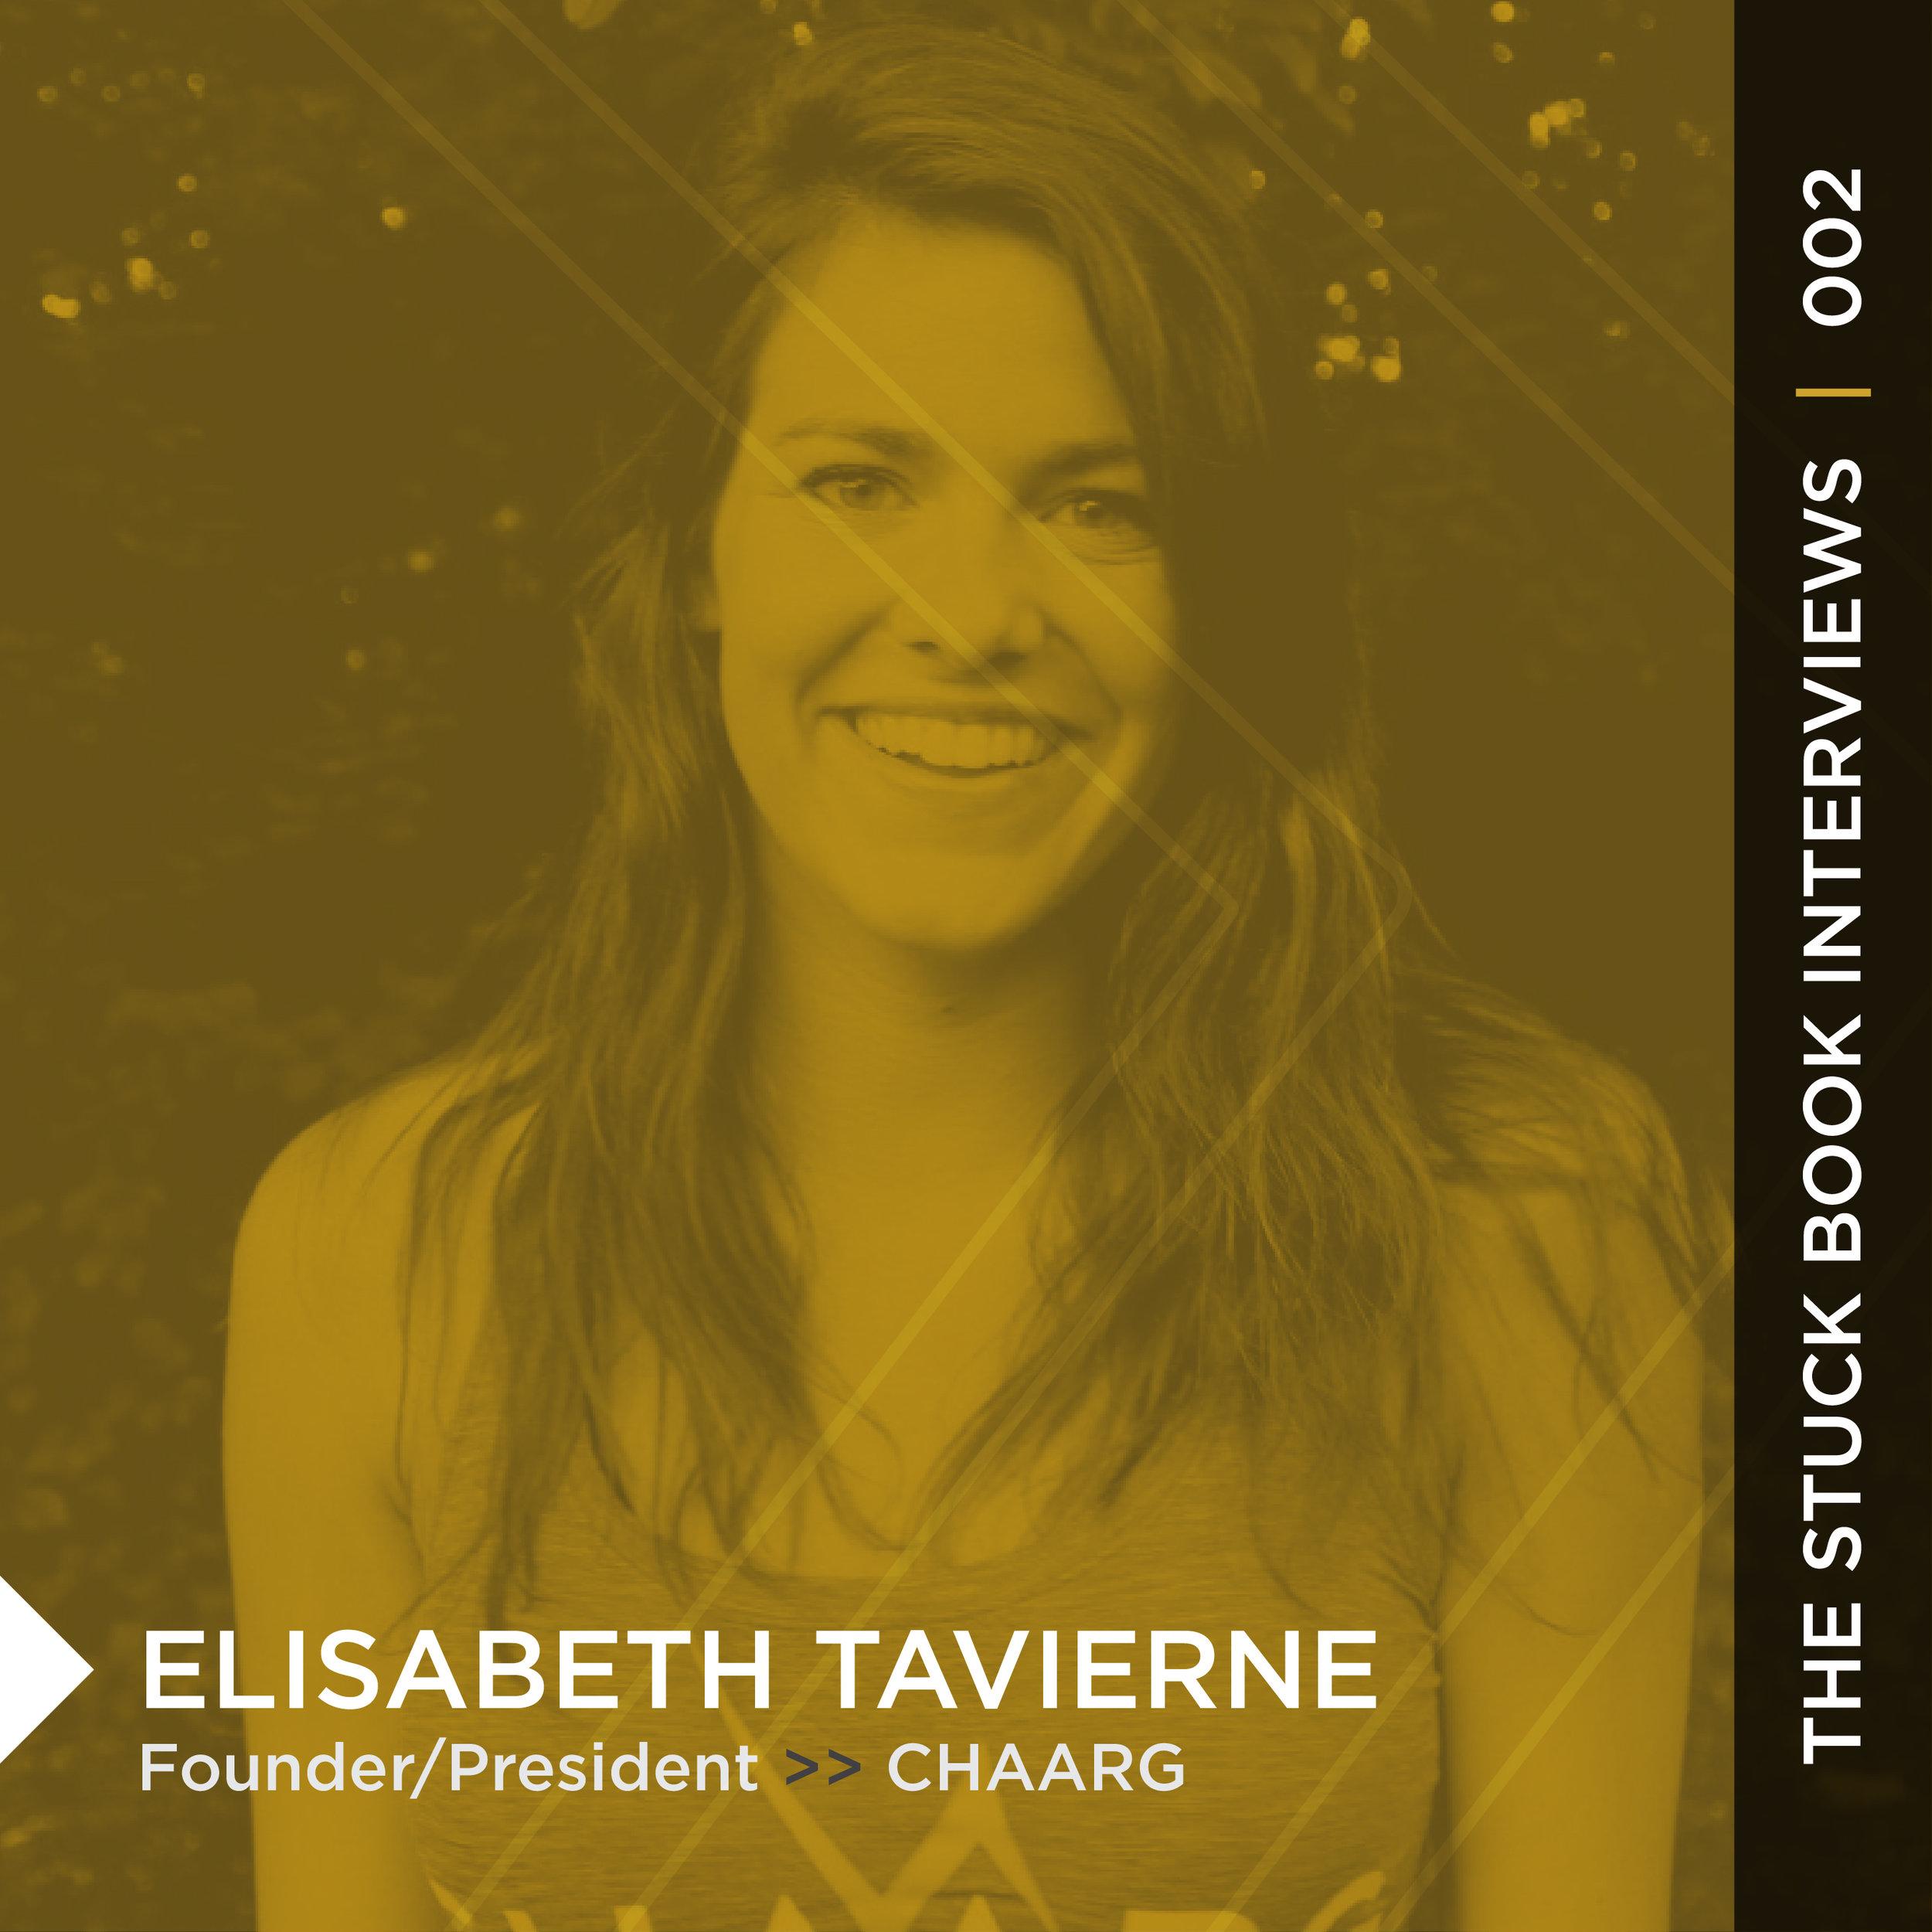 Elisabeth Tavierne